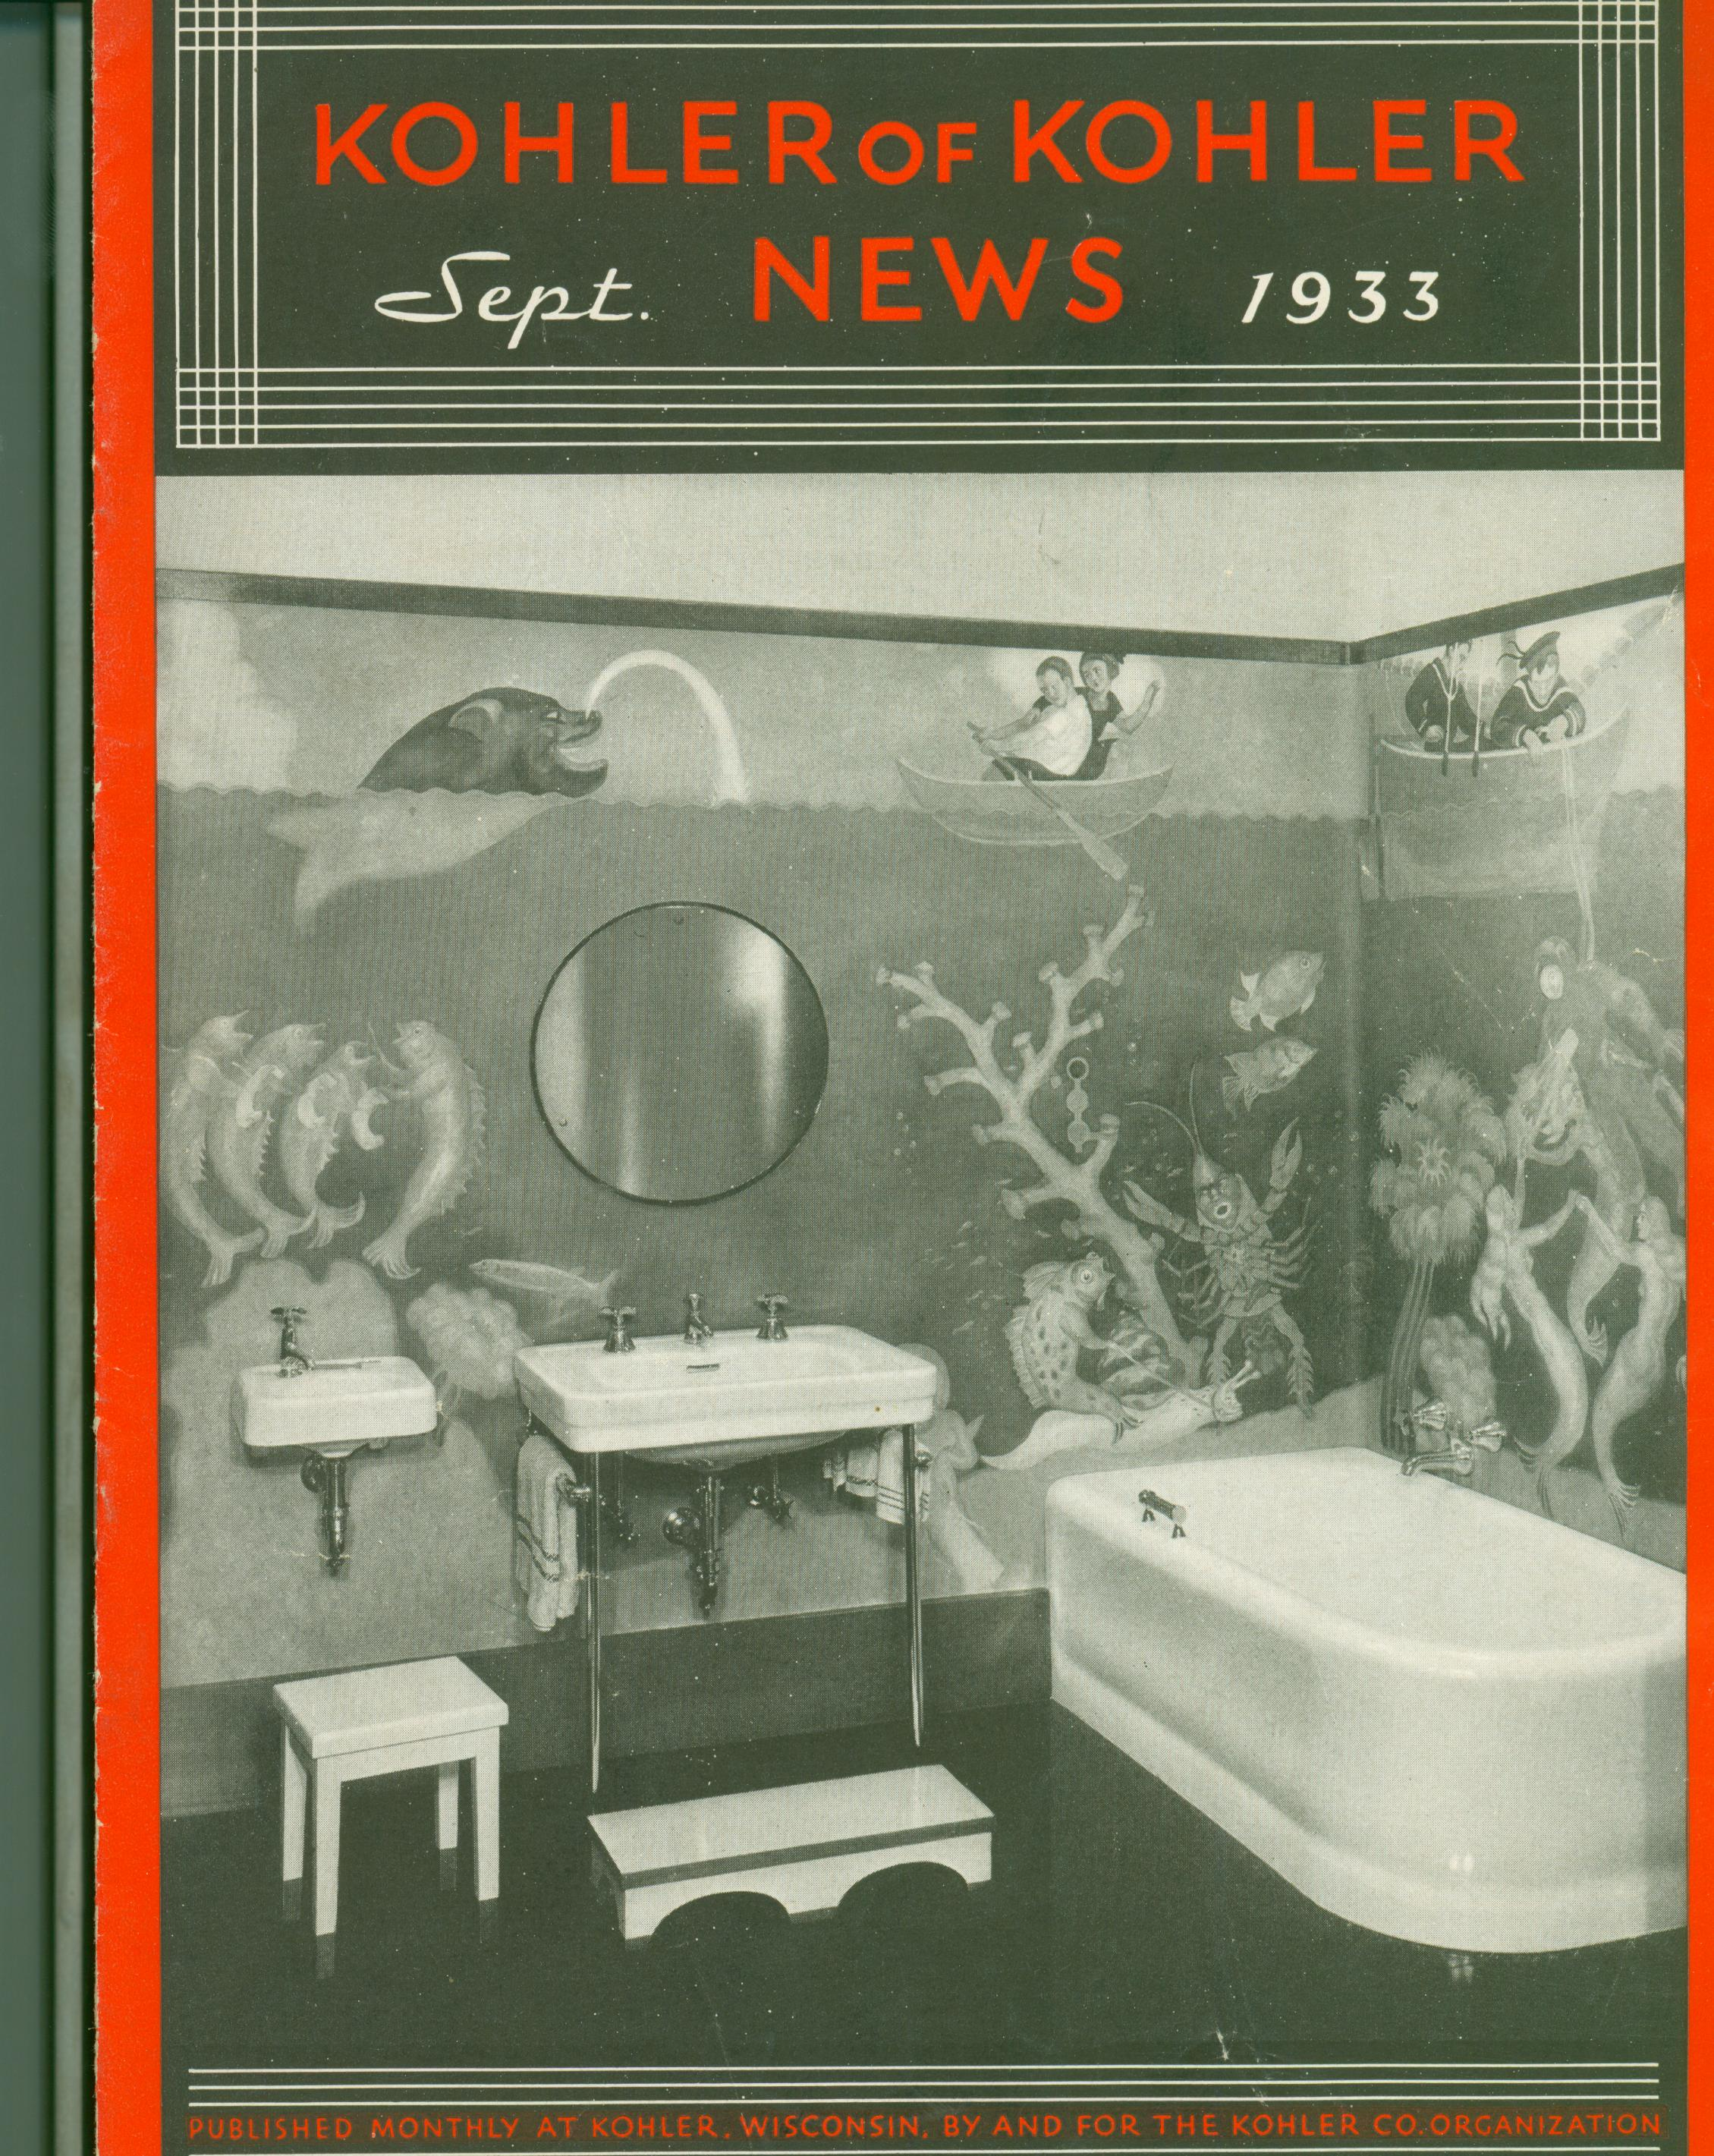 September 2011 Archives - The Bath BusinessThe Bath Business